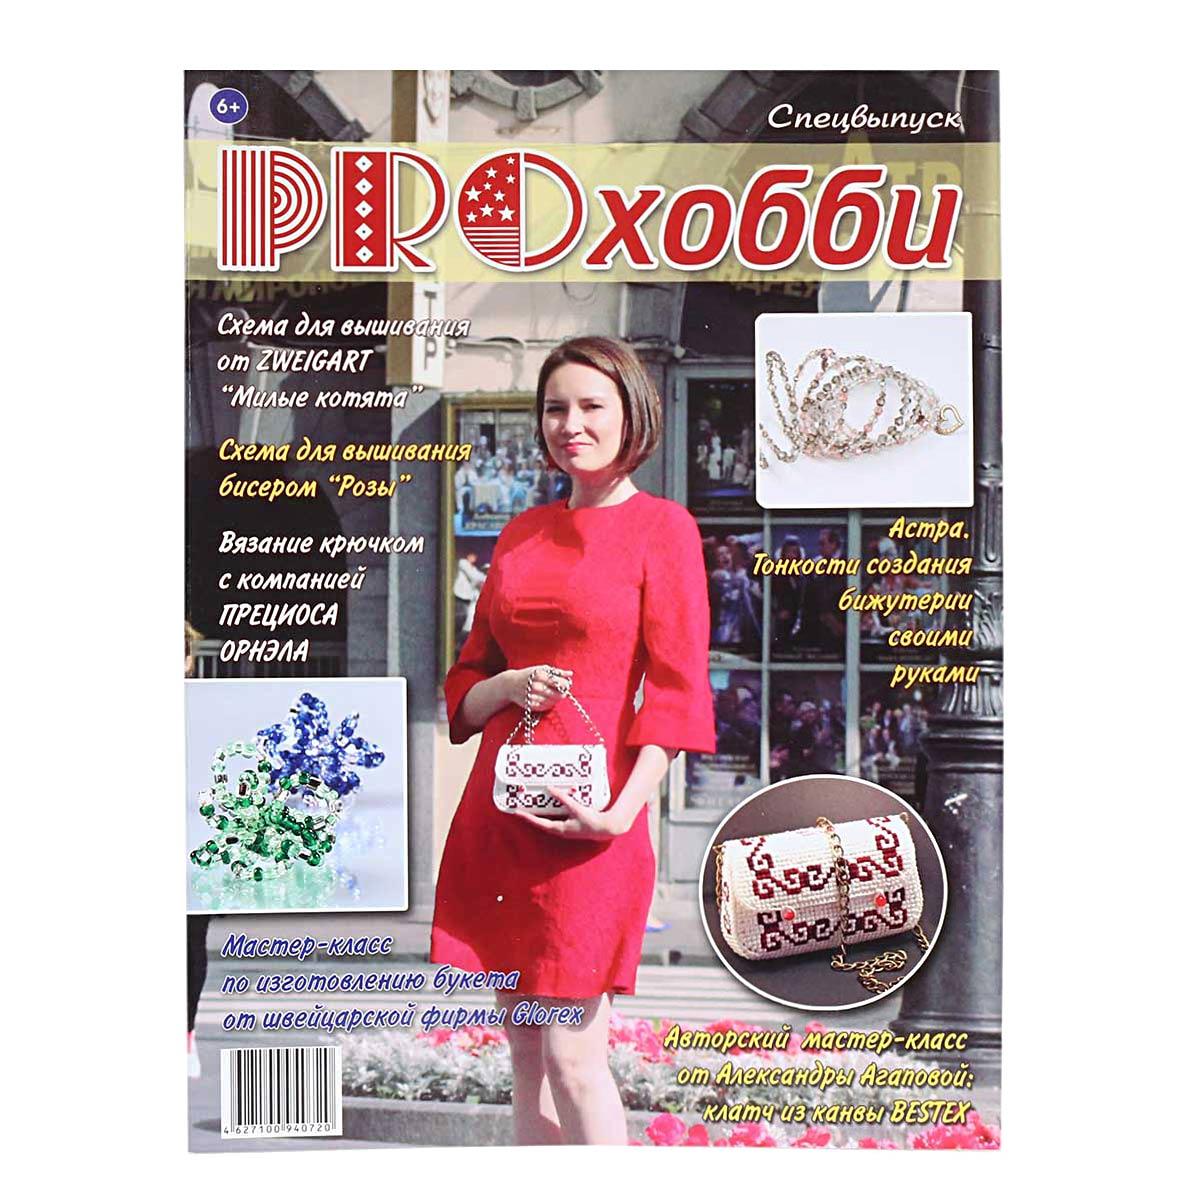 Журнал 'PRO хобби' Спецвыпуск